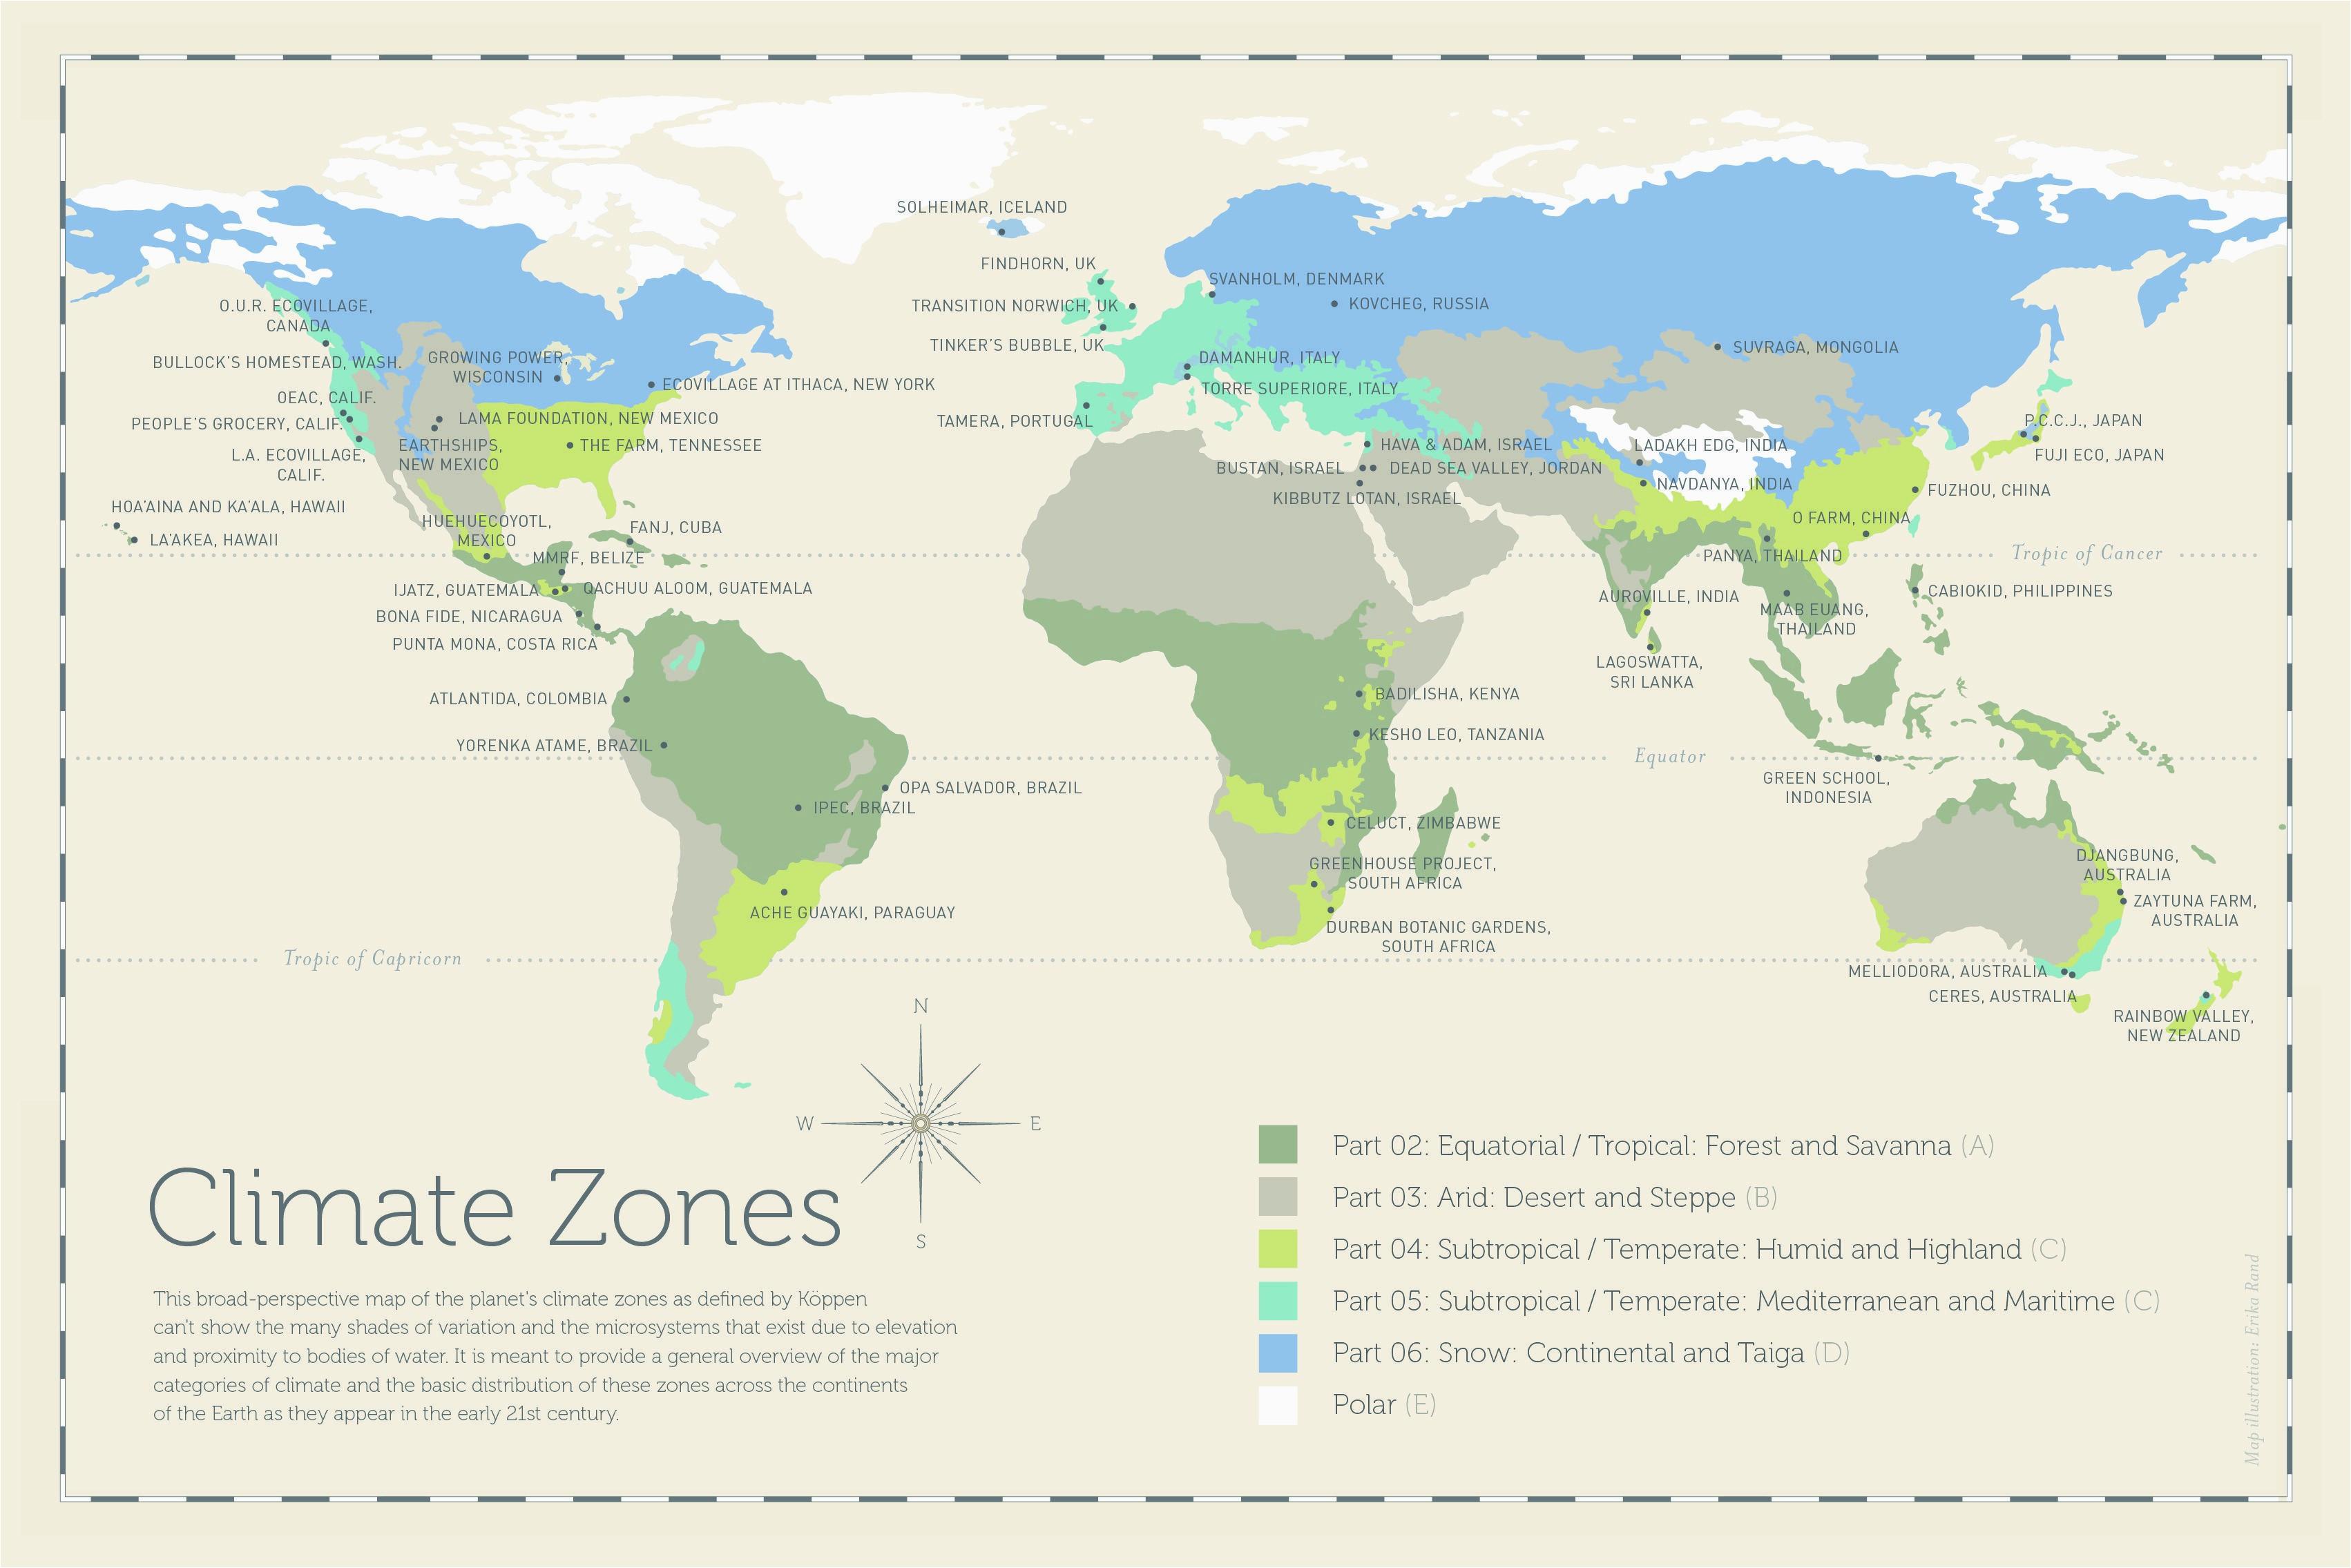 Map Of Canada Climate Zones.Colorado Climate Zone Map Climate Zone Map United States Fresh